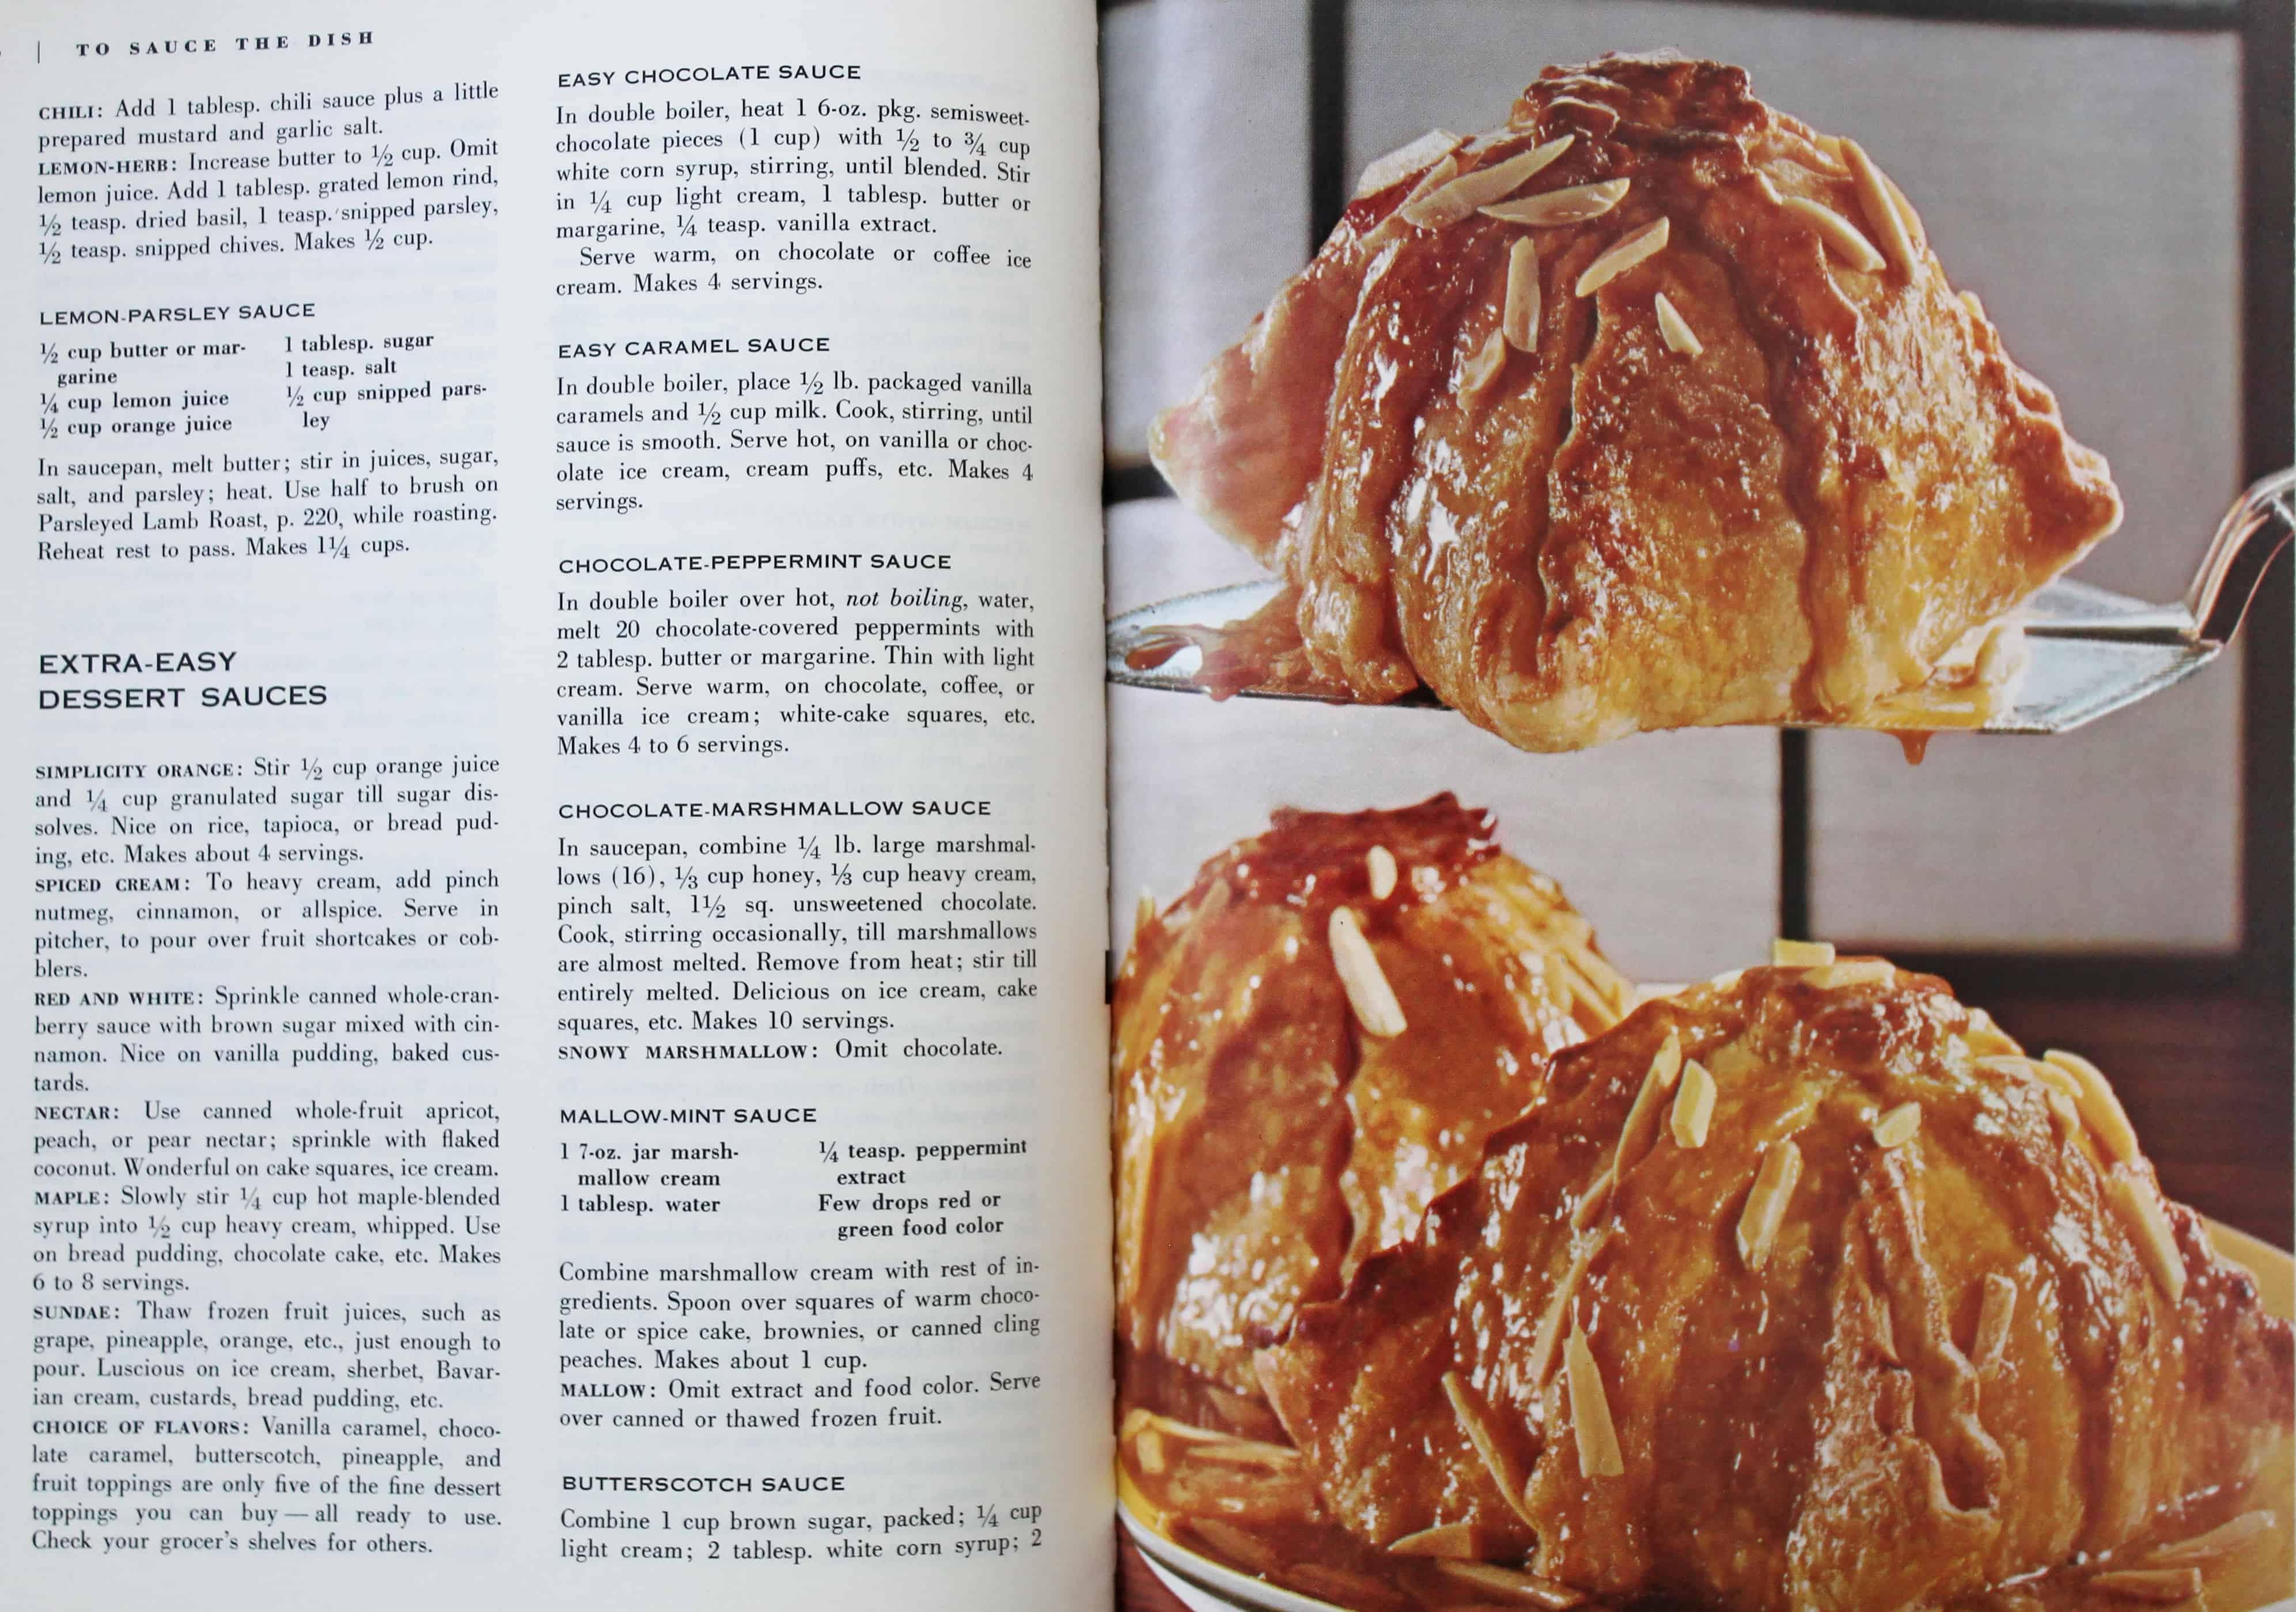 cookbooks by Good Housekeeping